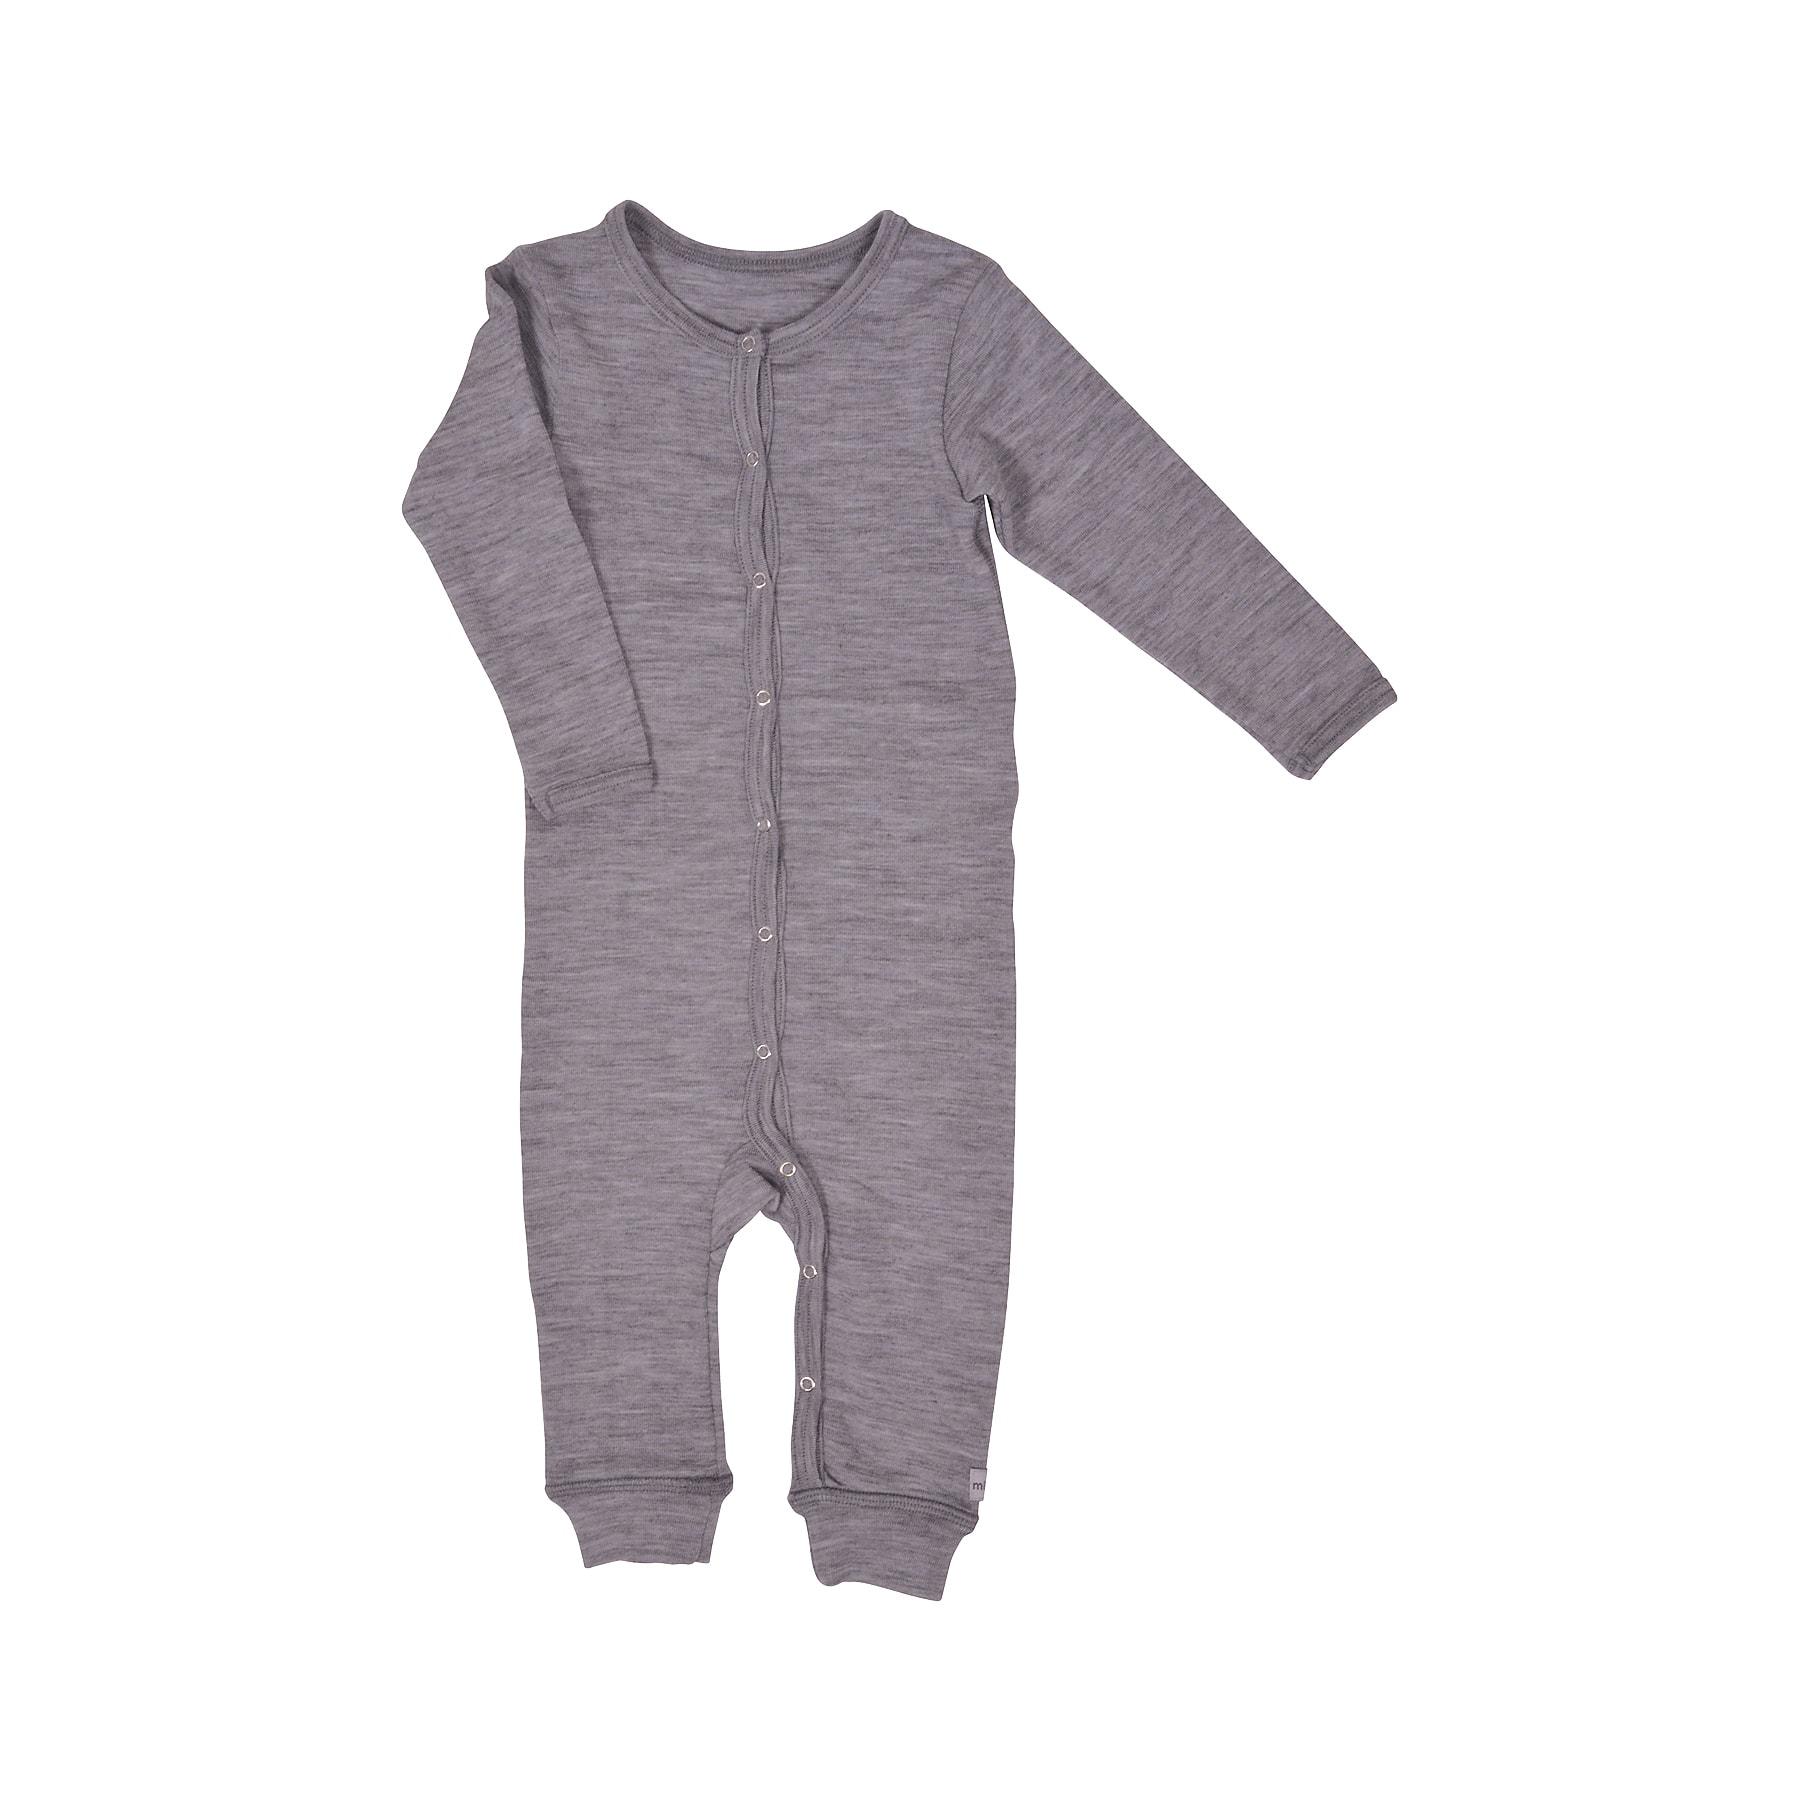 025d13d889a Natdragt i 100% merinould - Sovedragt til barn i grå uld - Mikk-Line